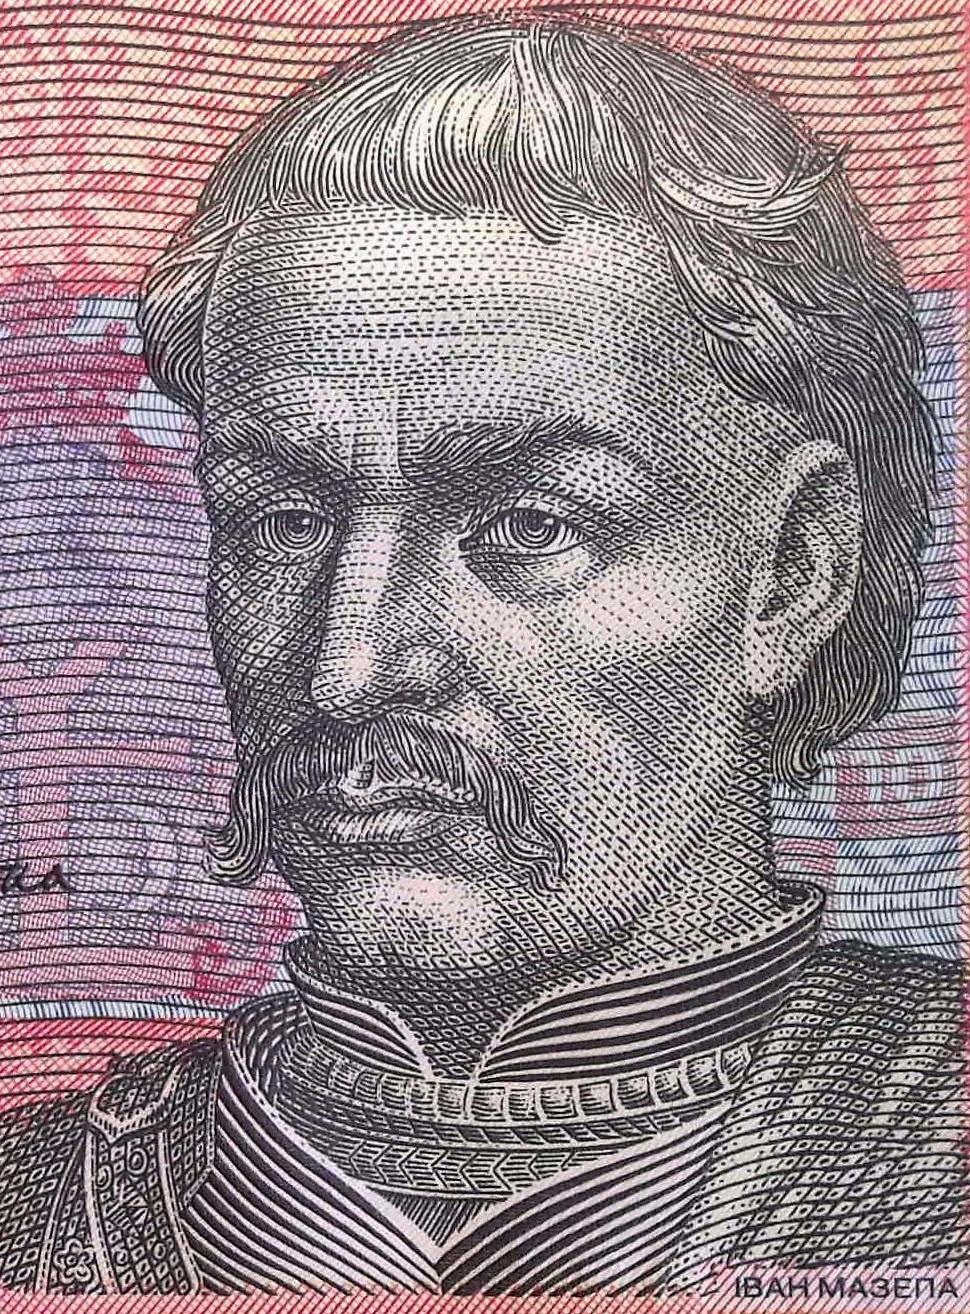 closeup detail of Ukraine 5 Hryvnia Banknote, Year 2013,, featuring portrait of  Ivan Mazepa